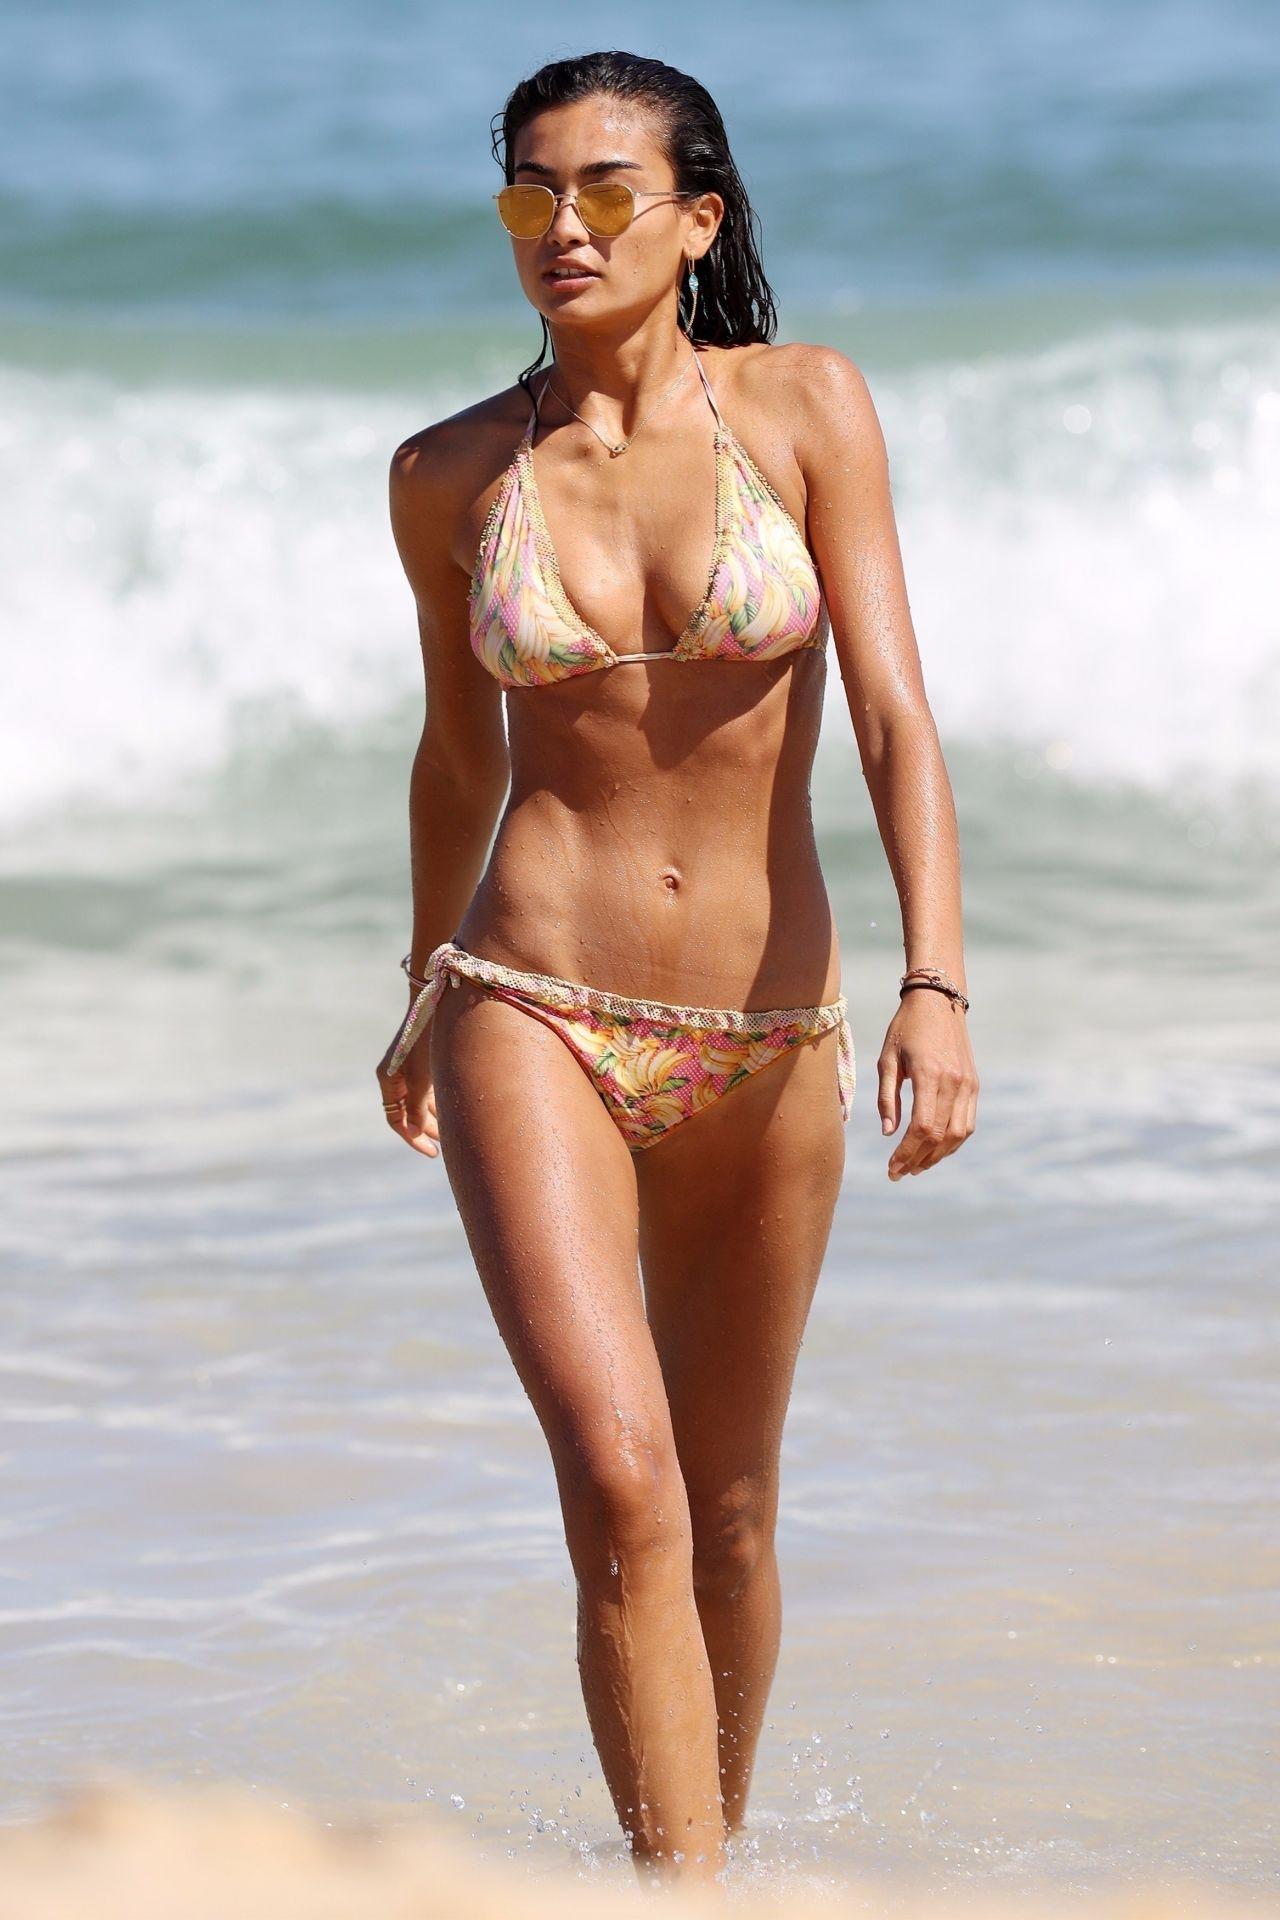 Kelly Gale in Bikini on Bondi Beach in Sydney Pic 3 of 35